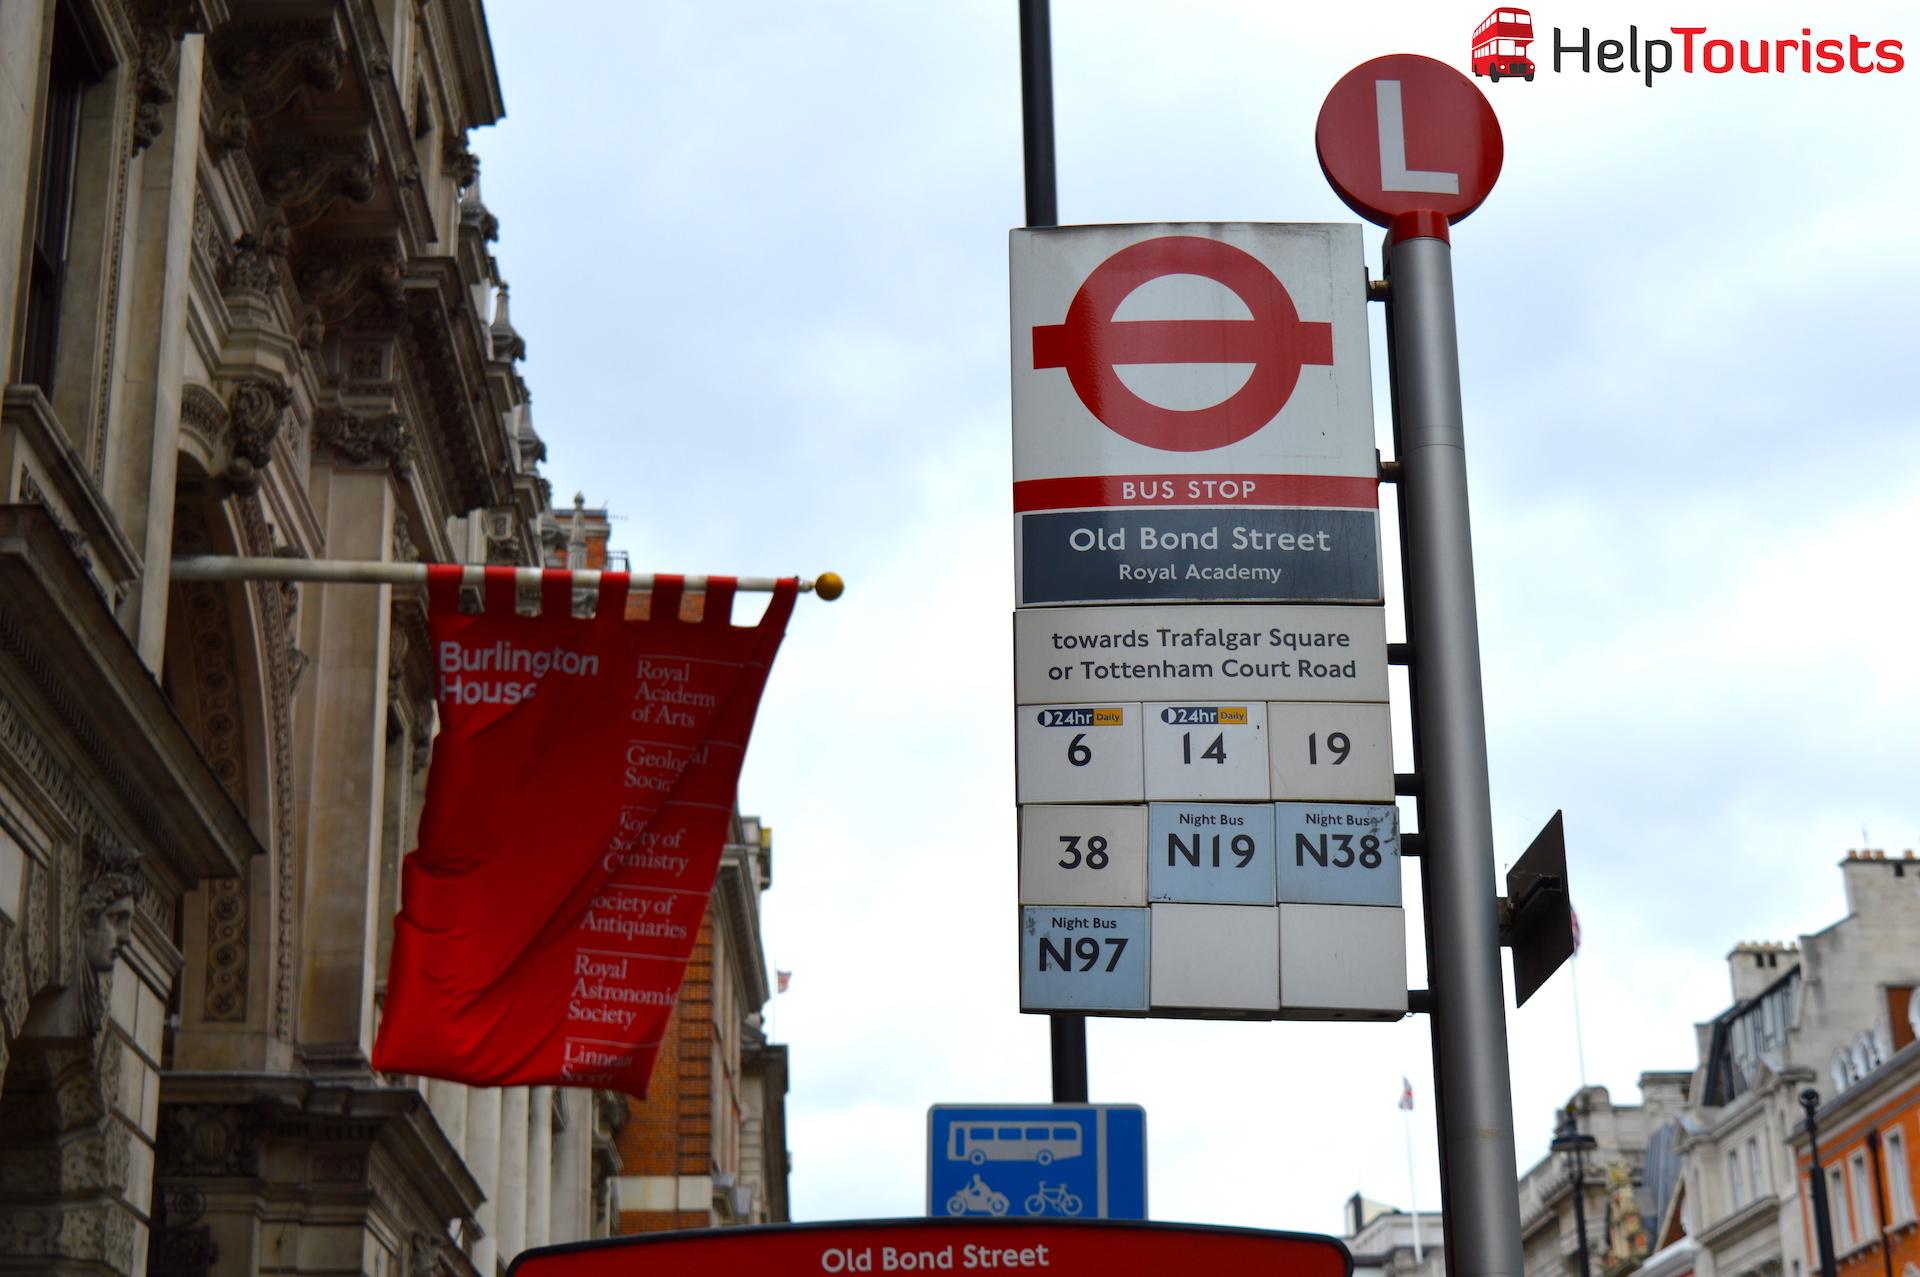 Bus Stop London Old Bond Street